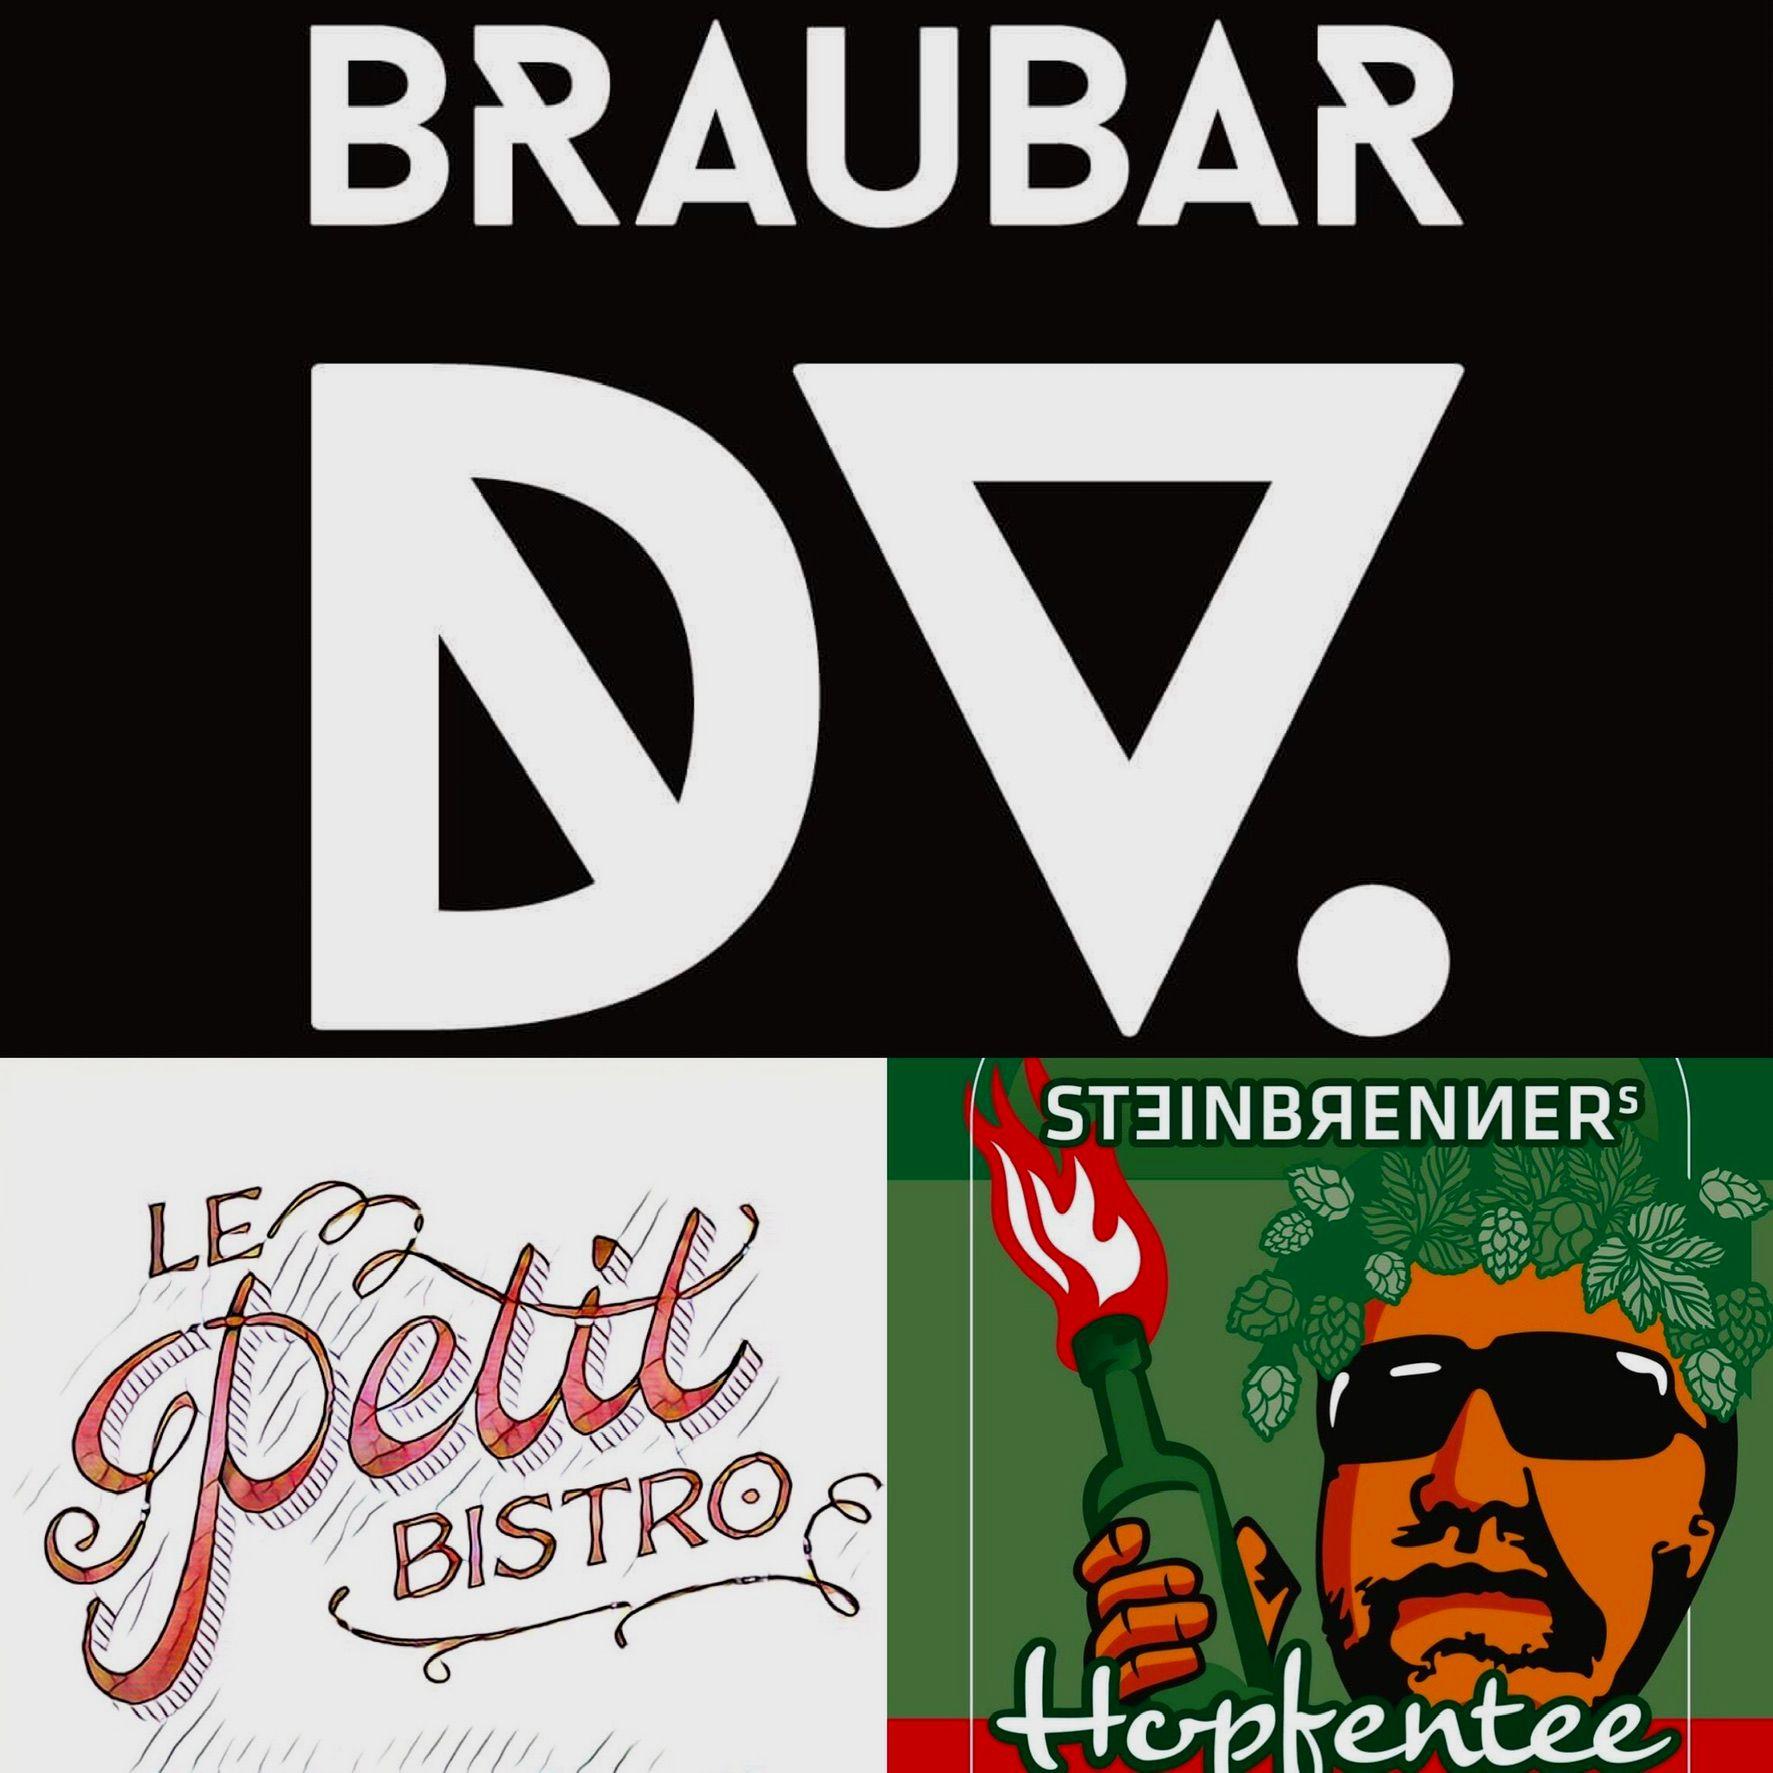 Steinbrenners Hopfentee-Braubar DV-Le petit Bistro